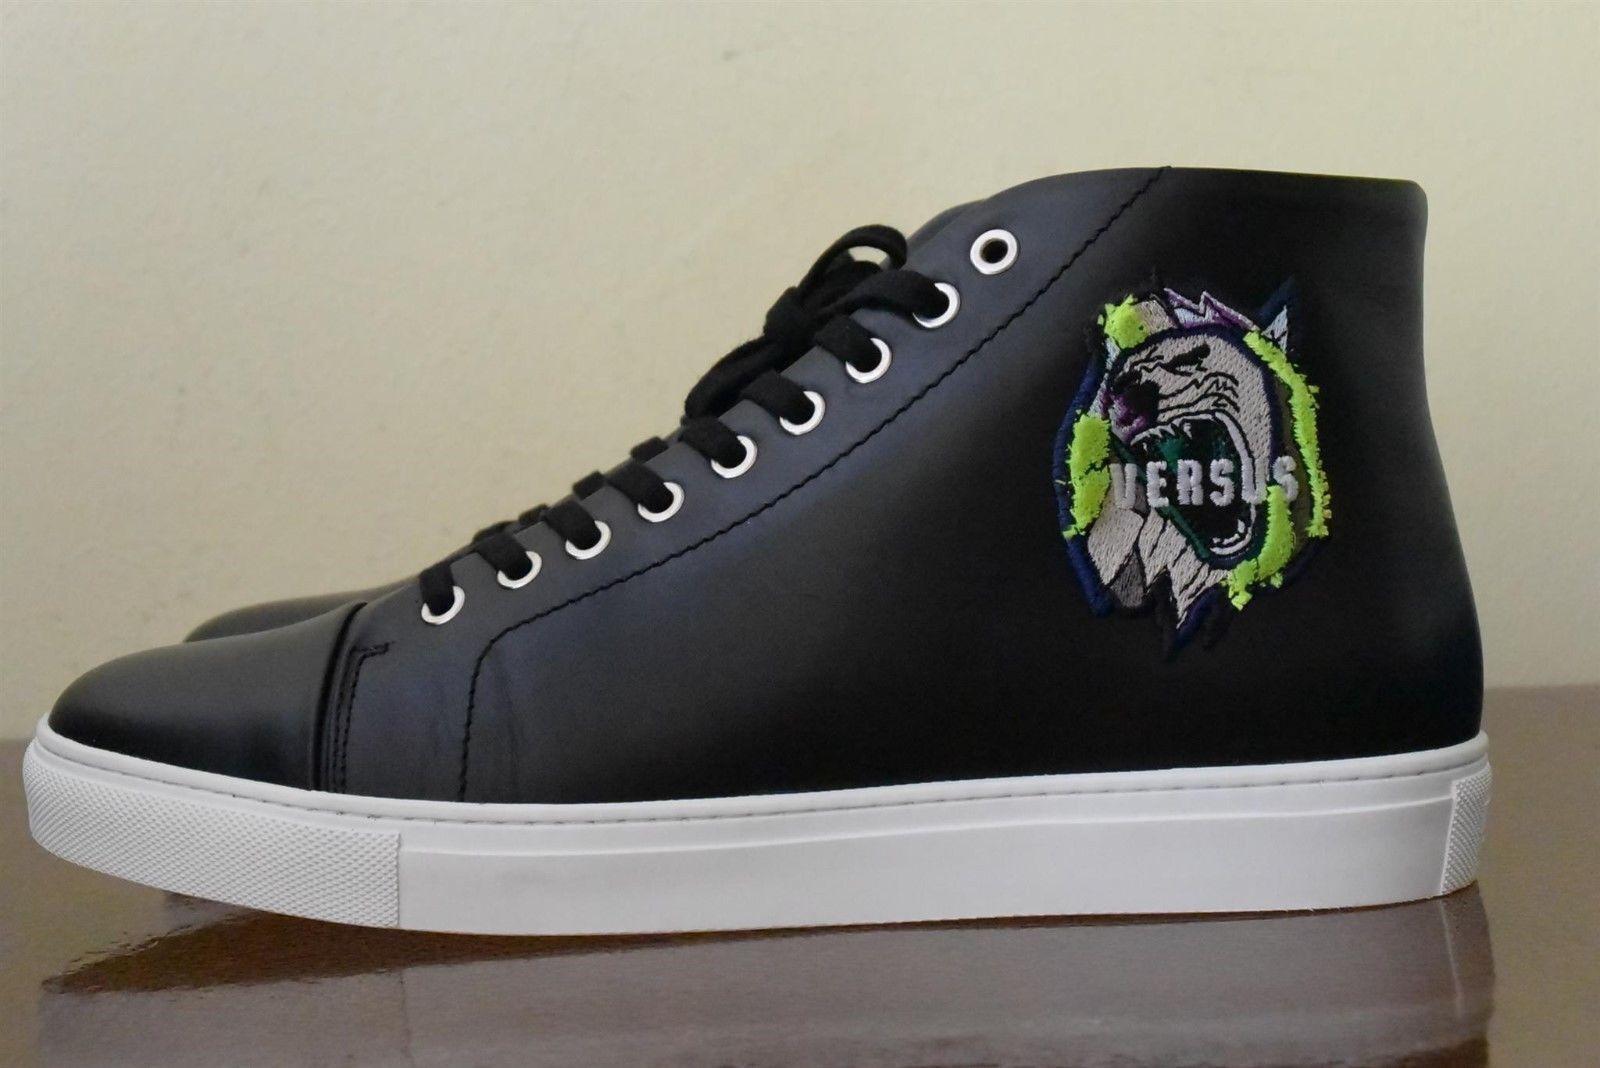 compra meglio VERSACE VERSUS Rebel Lion Patch nero Leather Leather Leather Hi-top scarpe da ginnastica Sz 10 (44)  grandi prezzi scontati